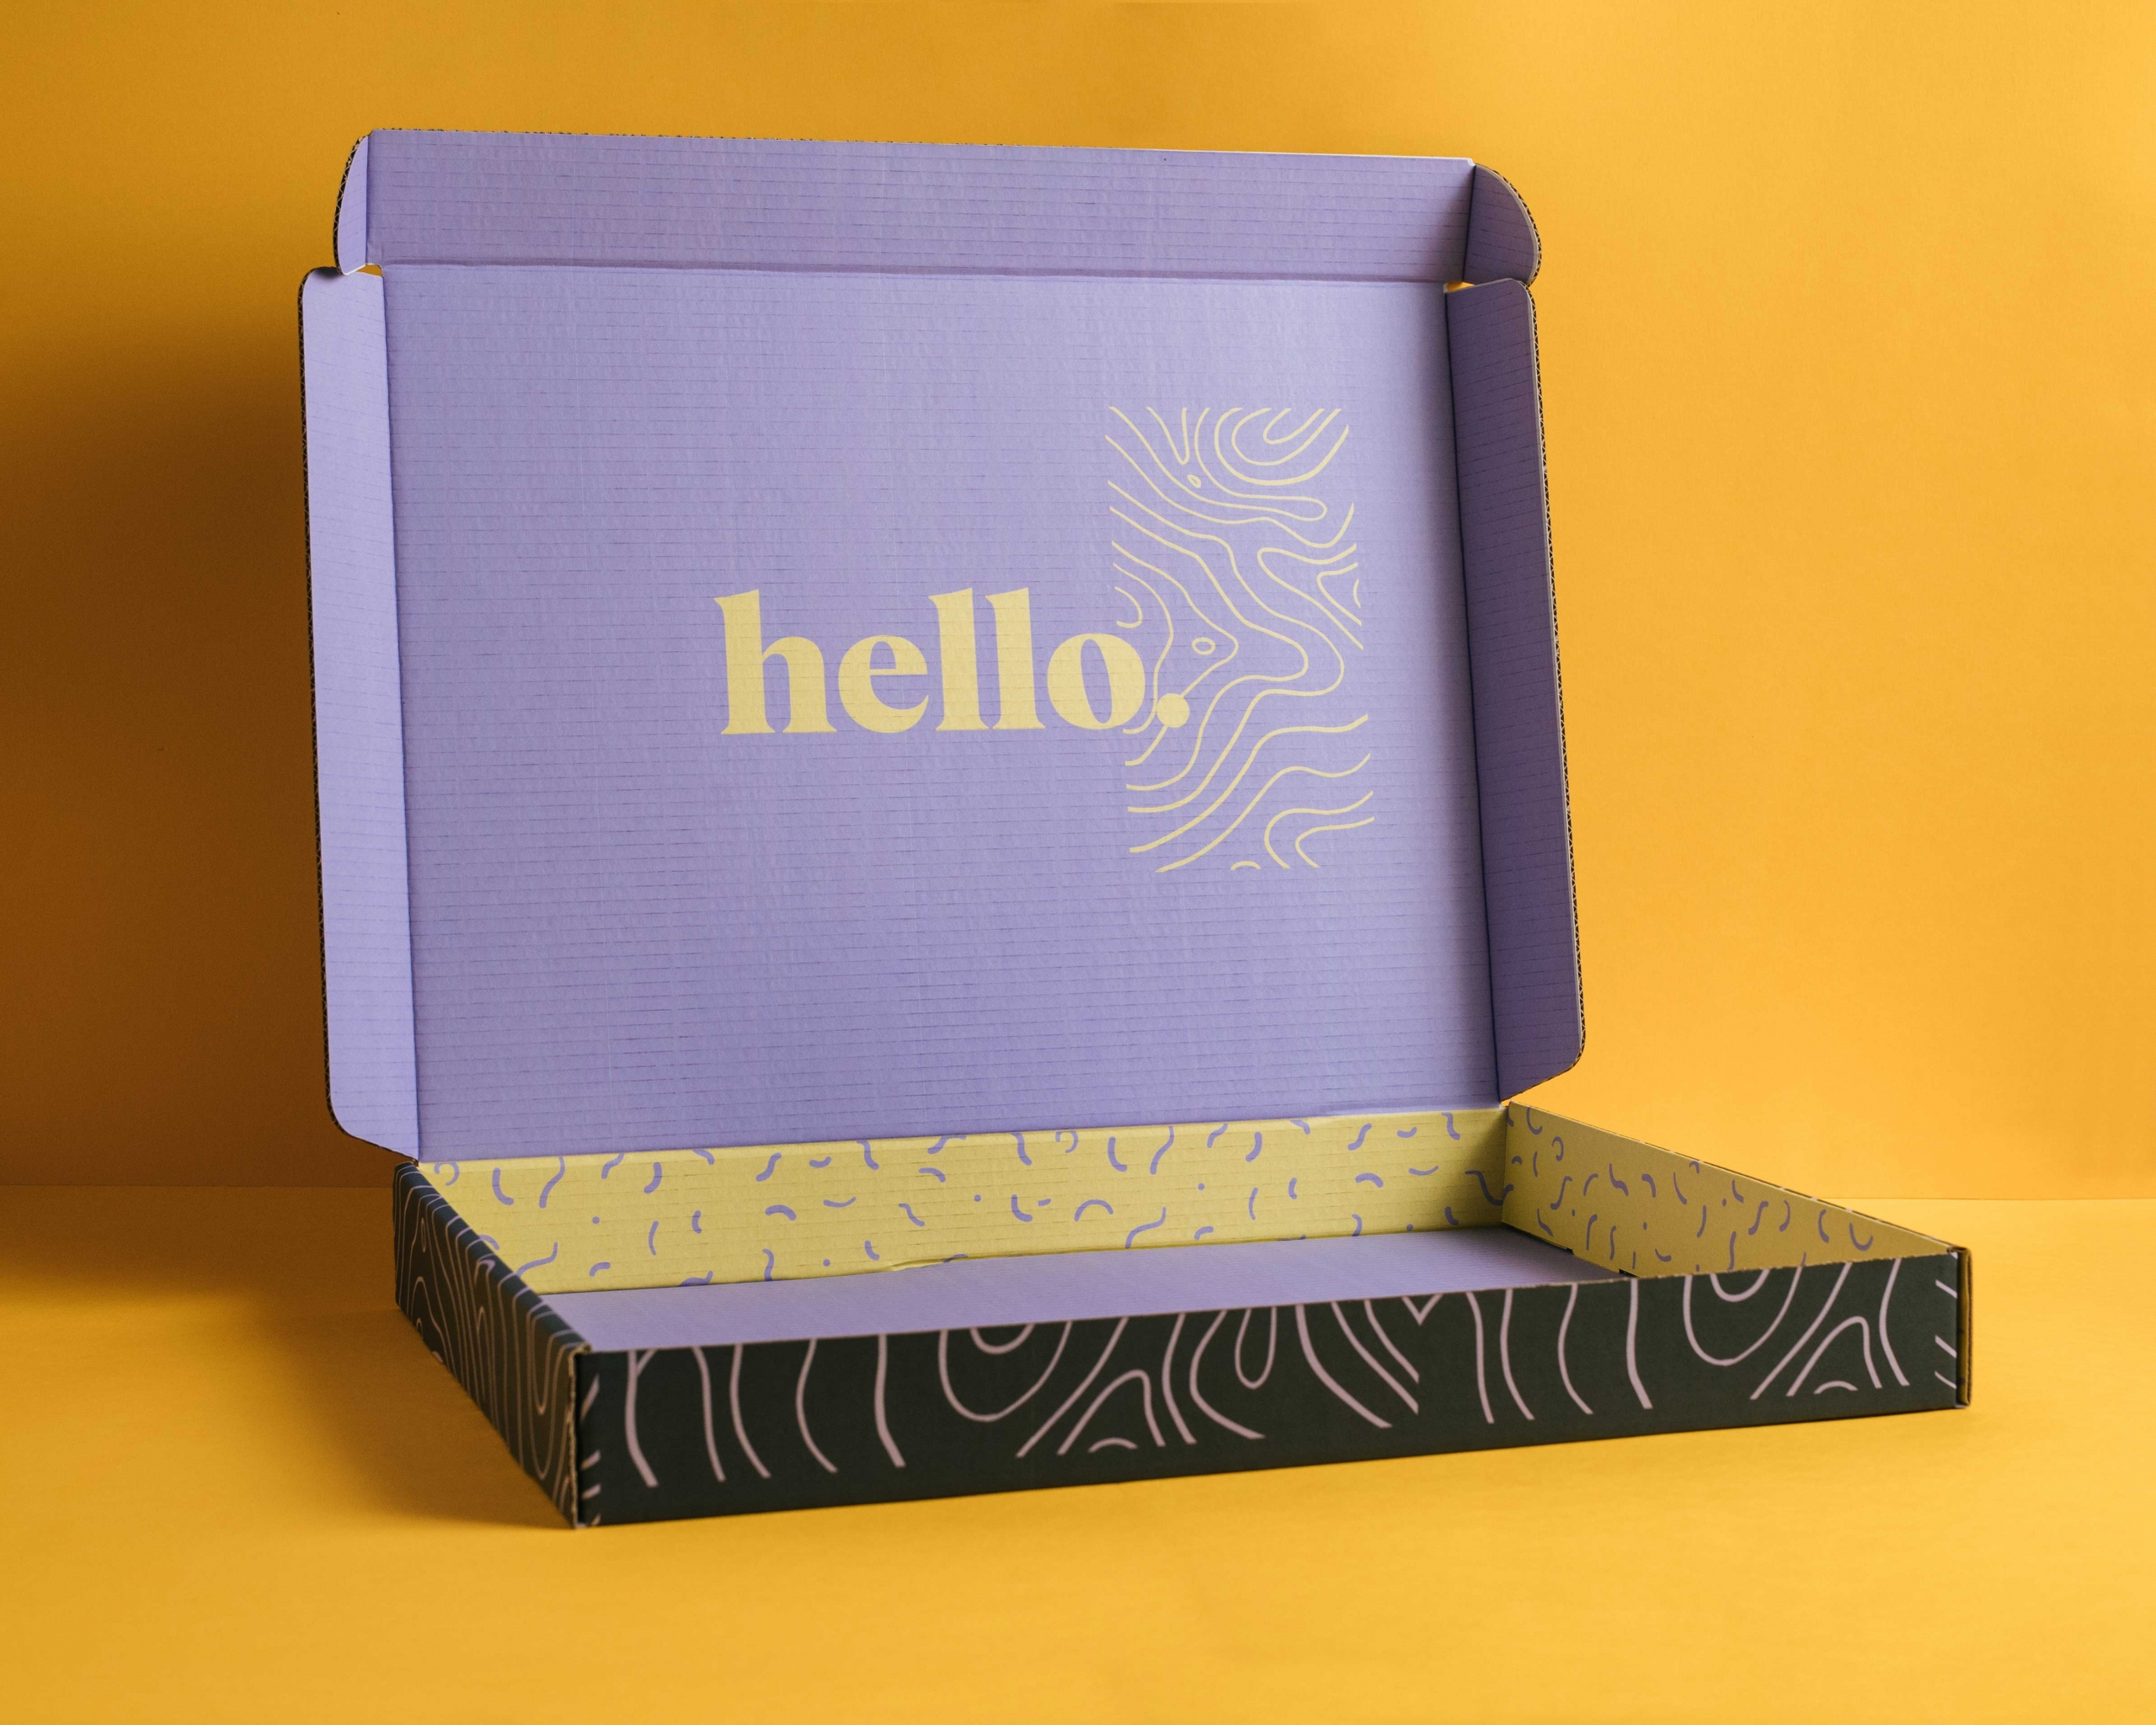 Digital Self Folding Box Inside